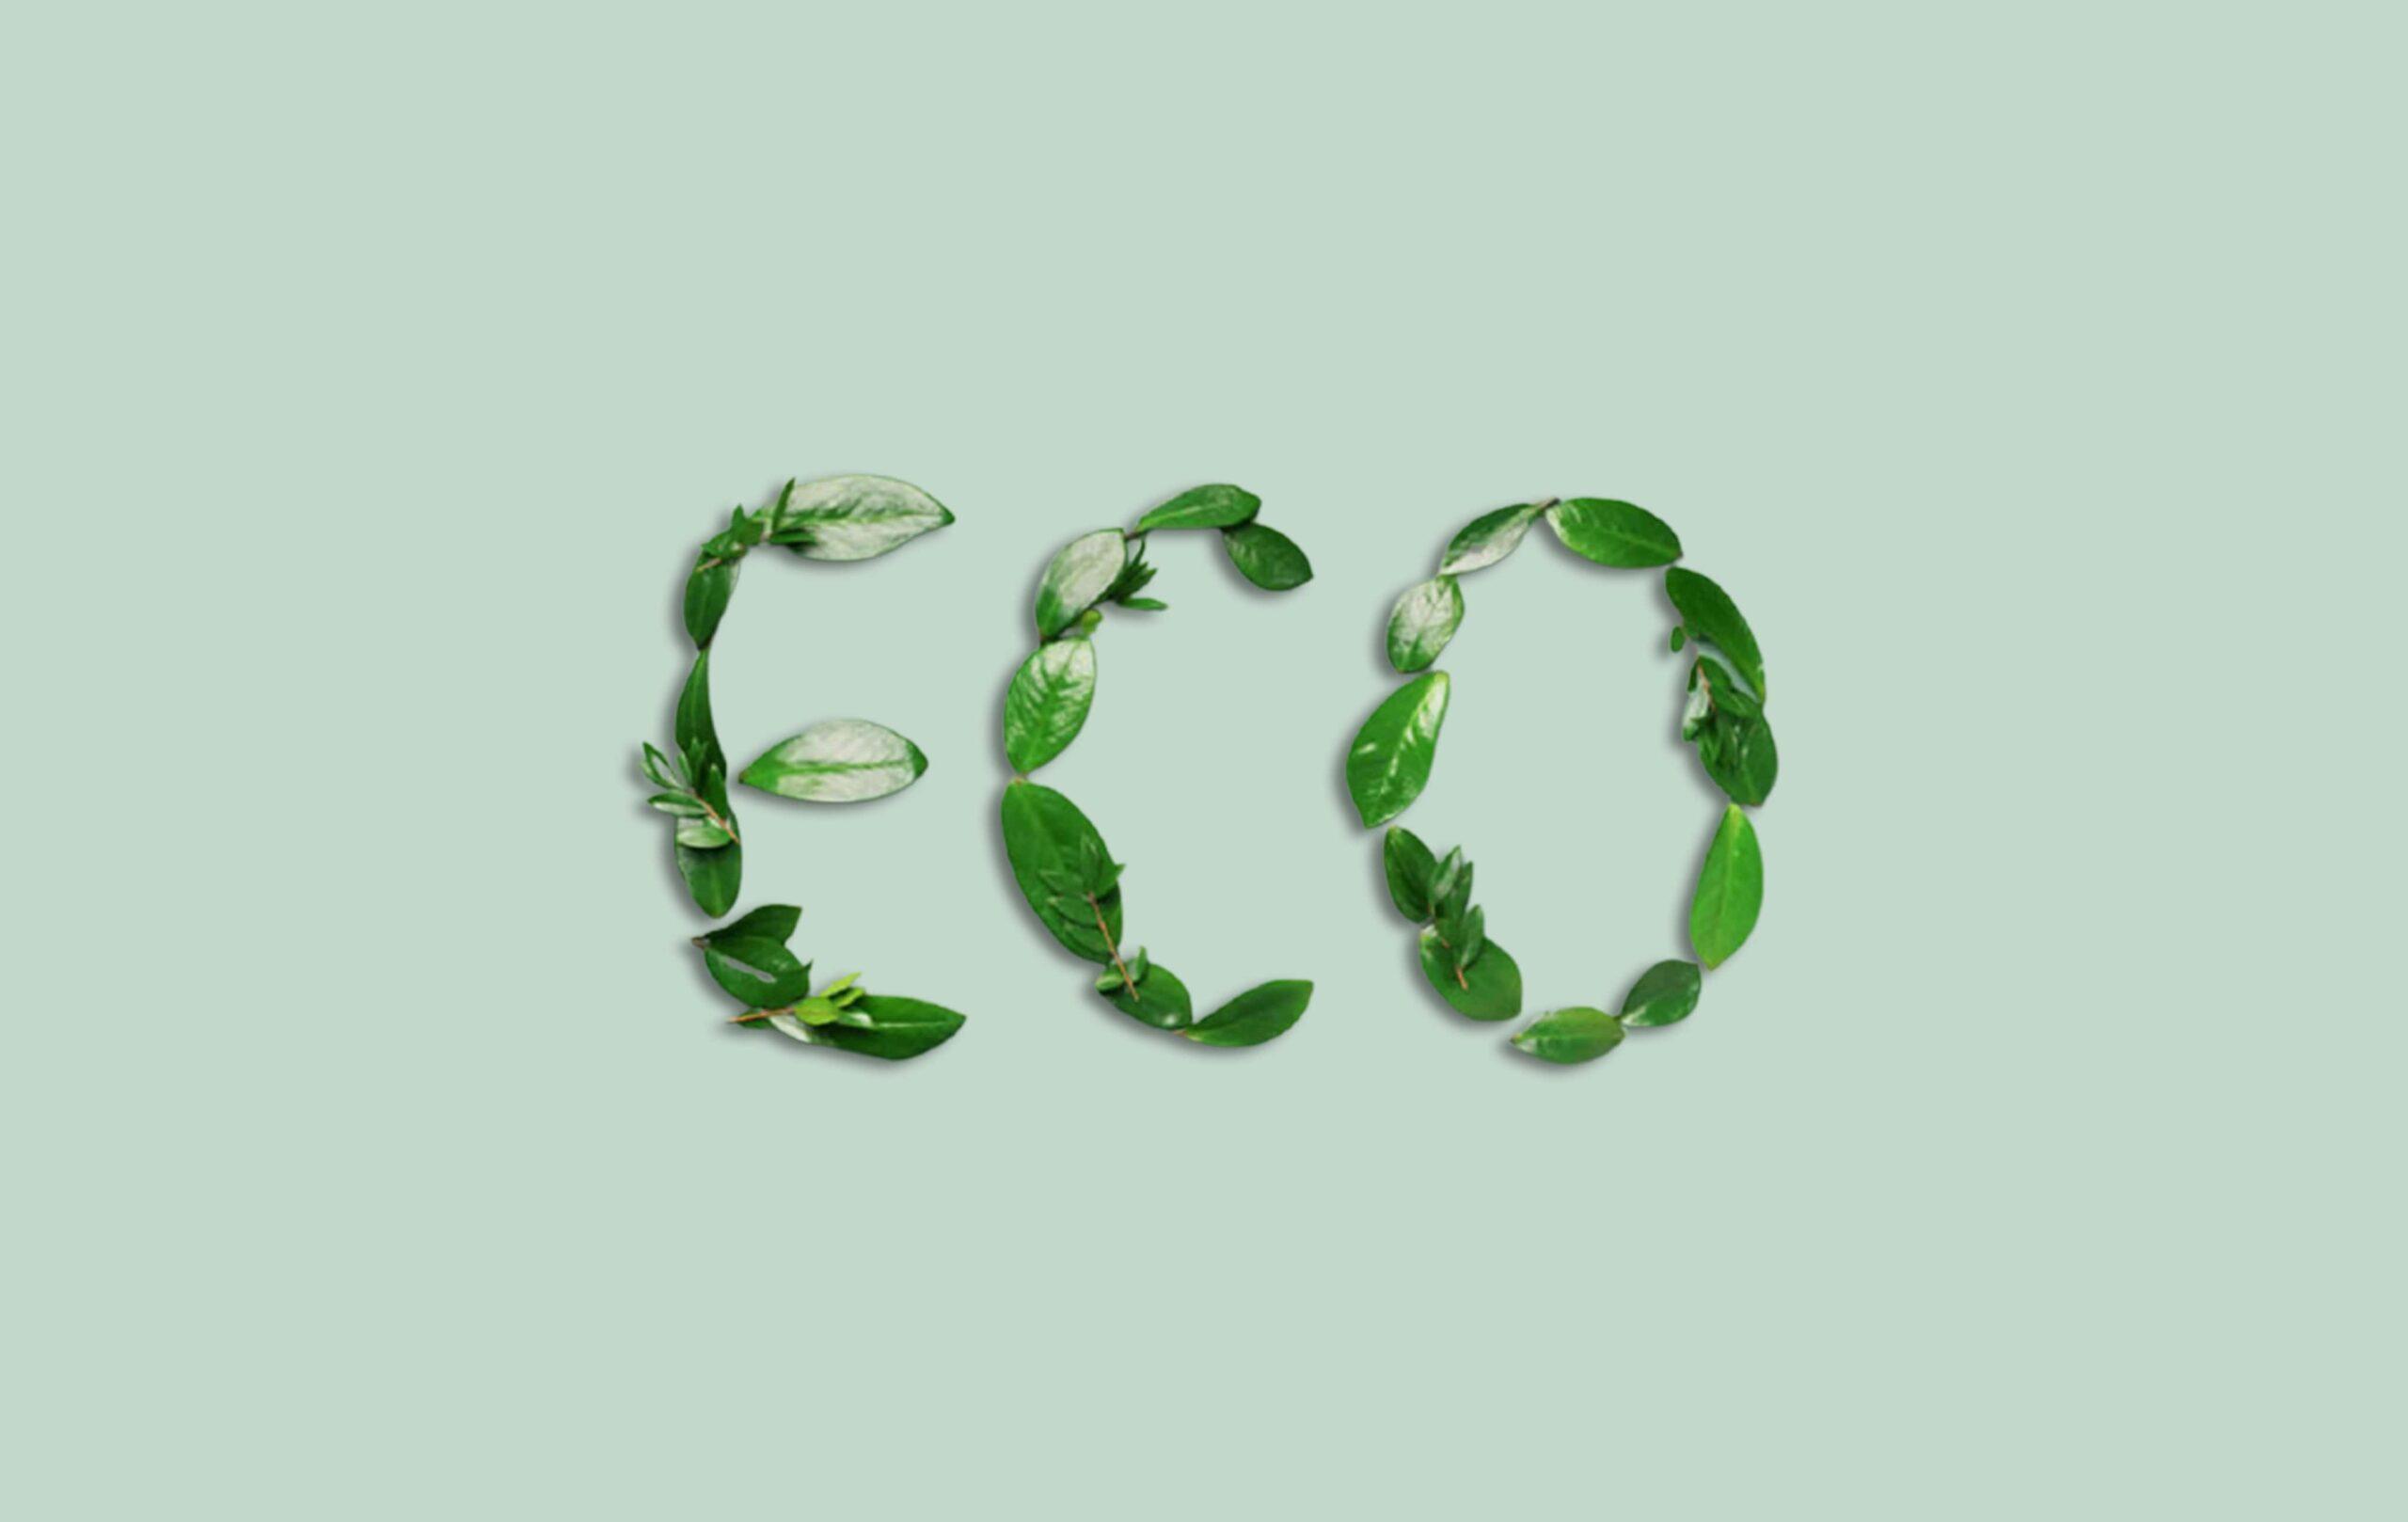 Kosmetik Eco-Friendly Yang Sangat Baik Untuk Tubuh dan Lingkungan